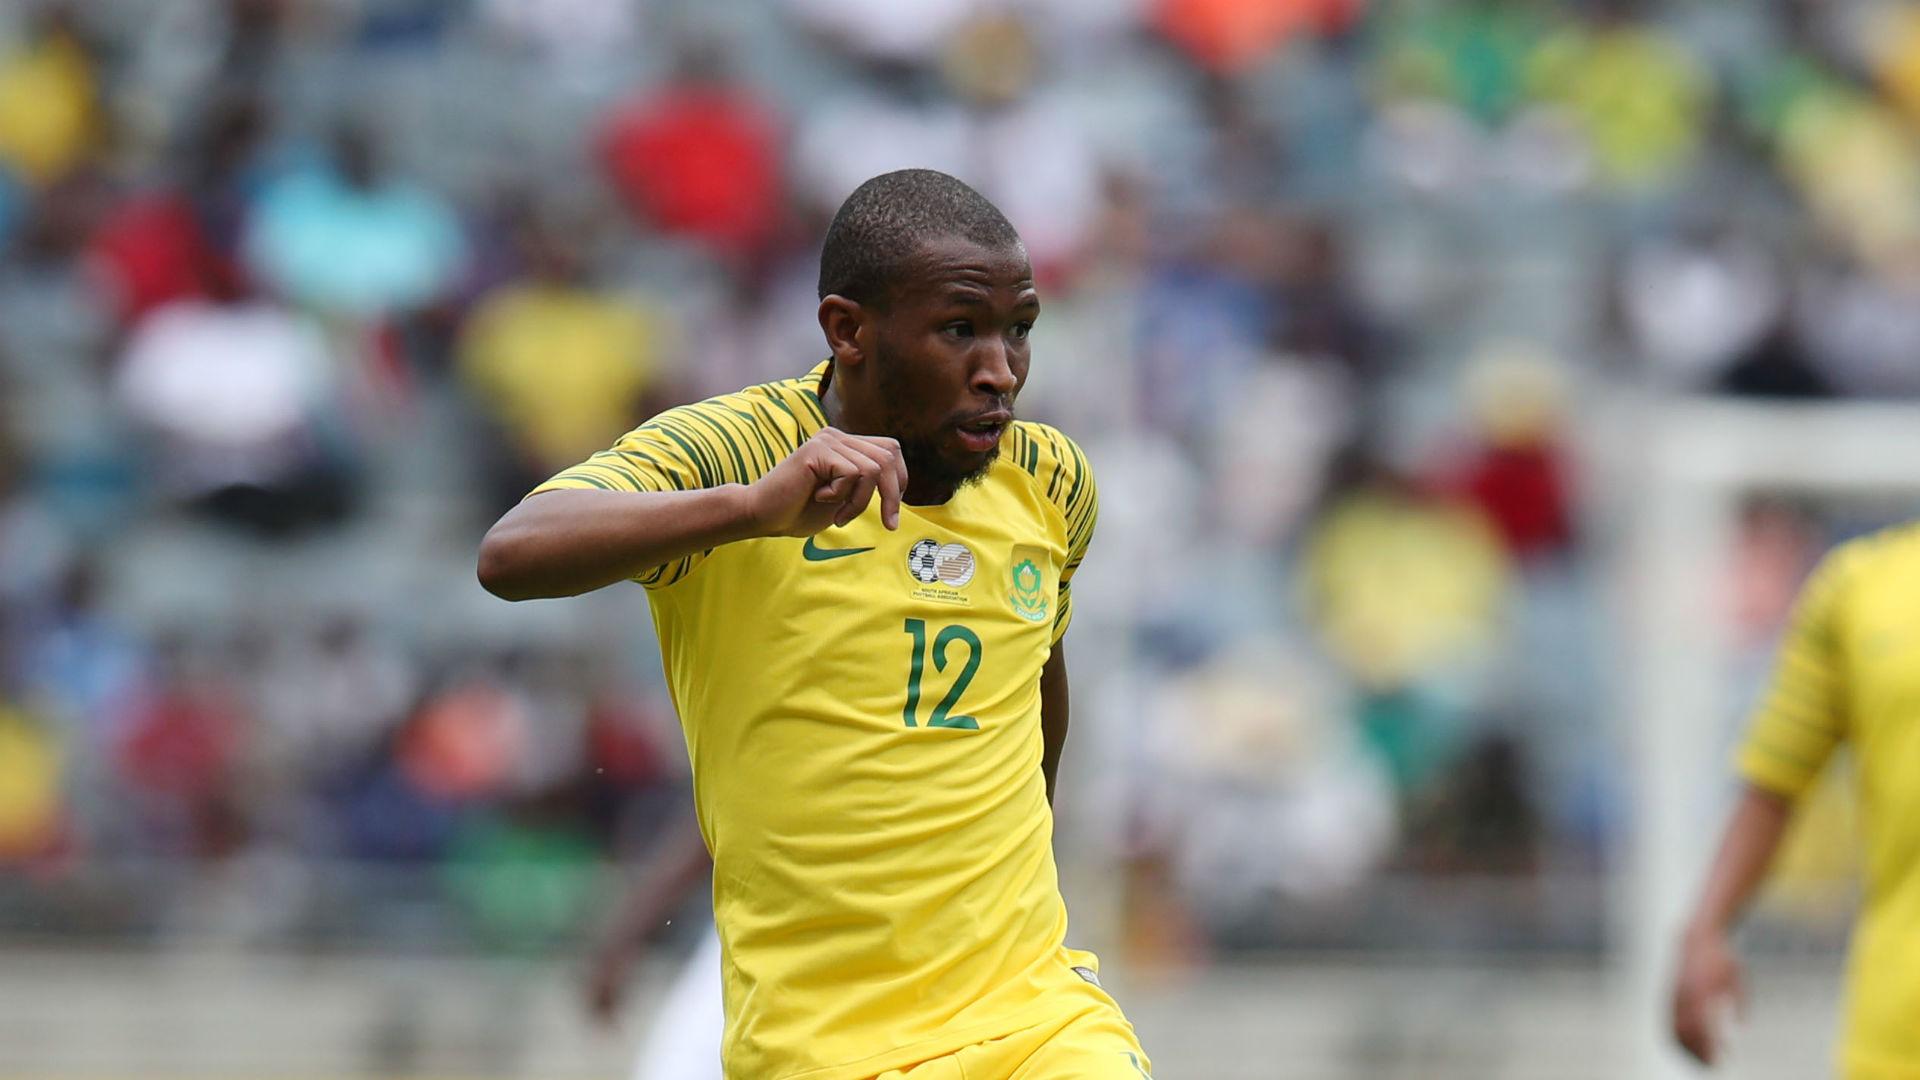 Mokotjo: Bafana Bafana international joins FC Cincinnati after leaving Brentford